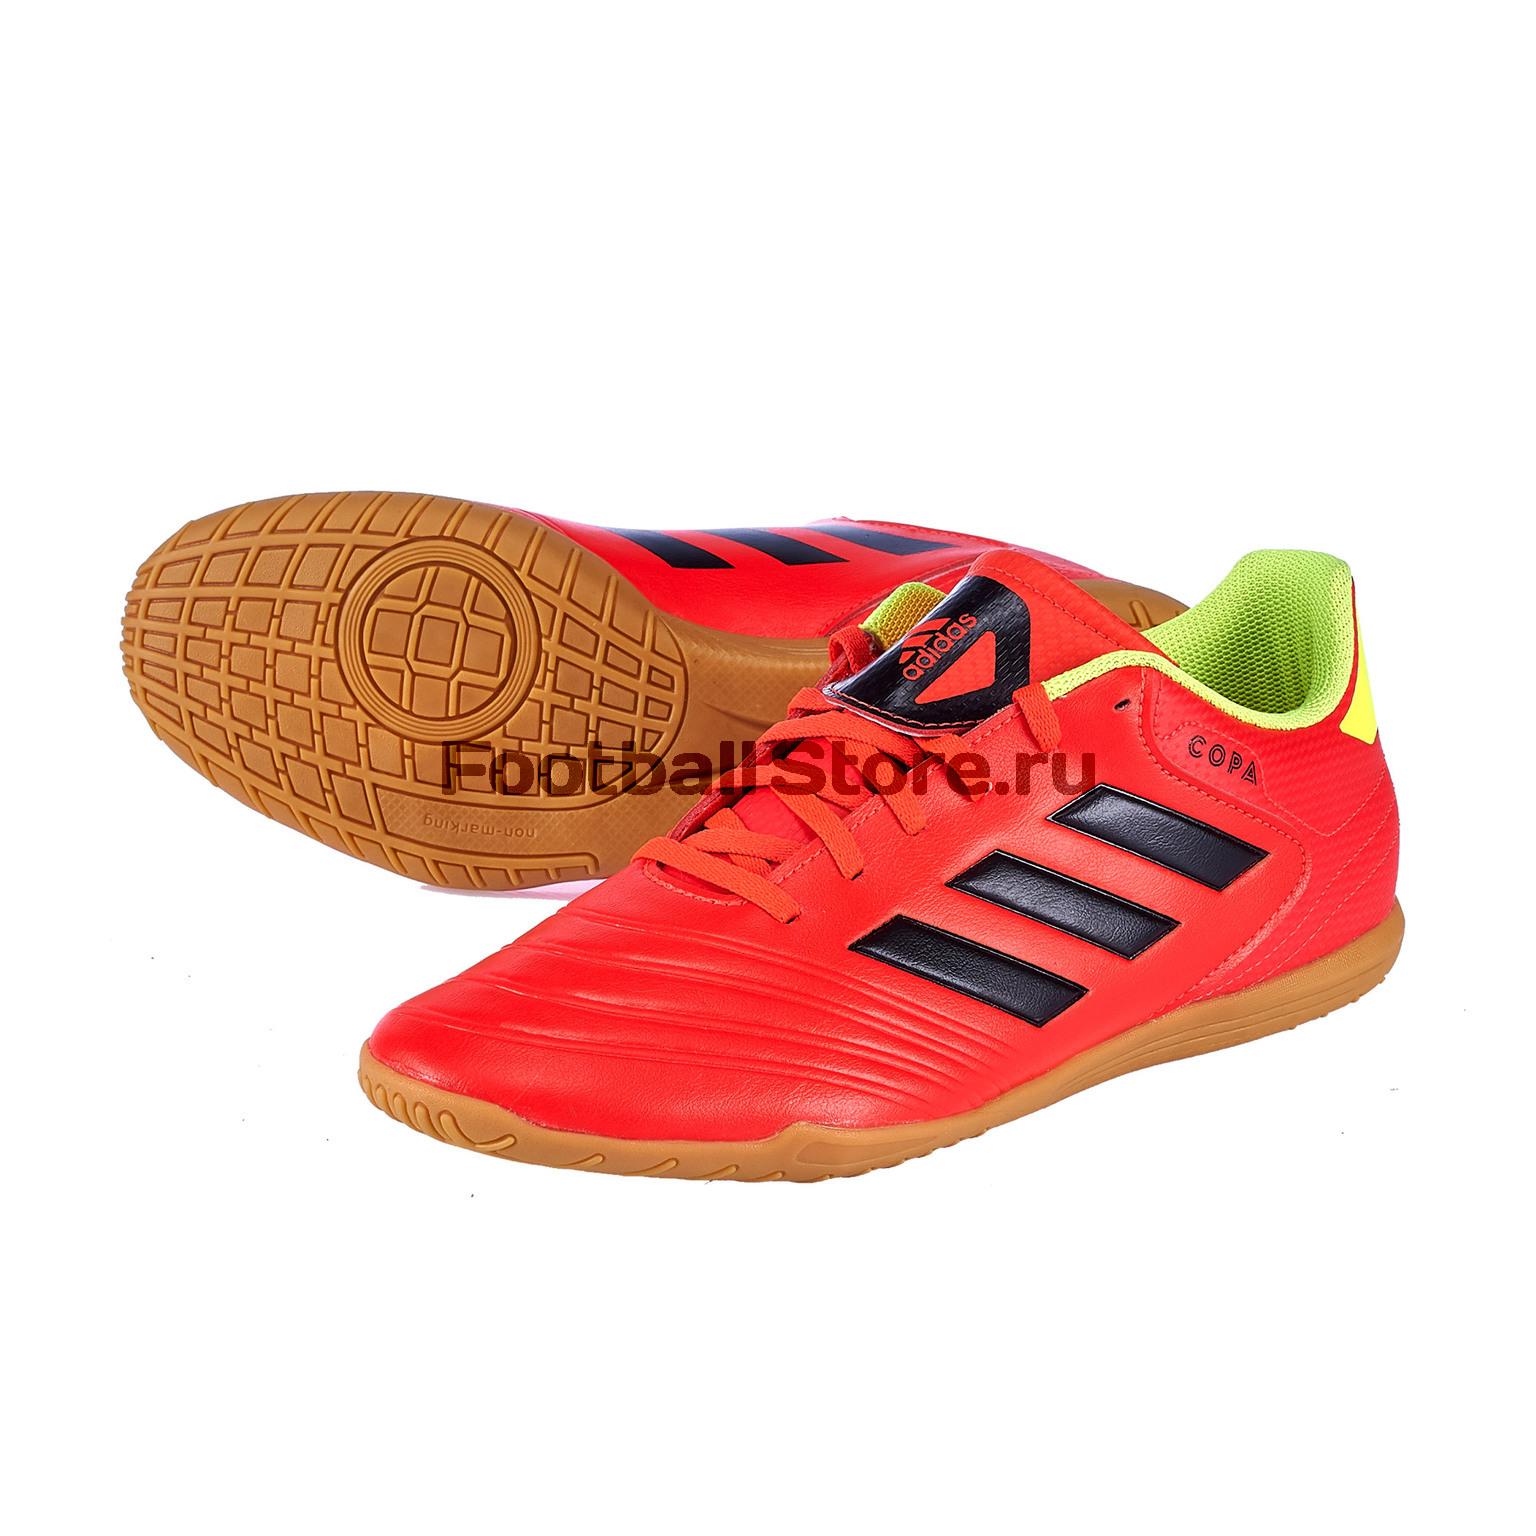 Футзалки Adidas Copa Tango 18.4 IN DB2447 цена